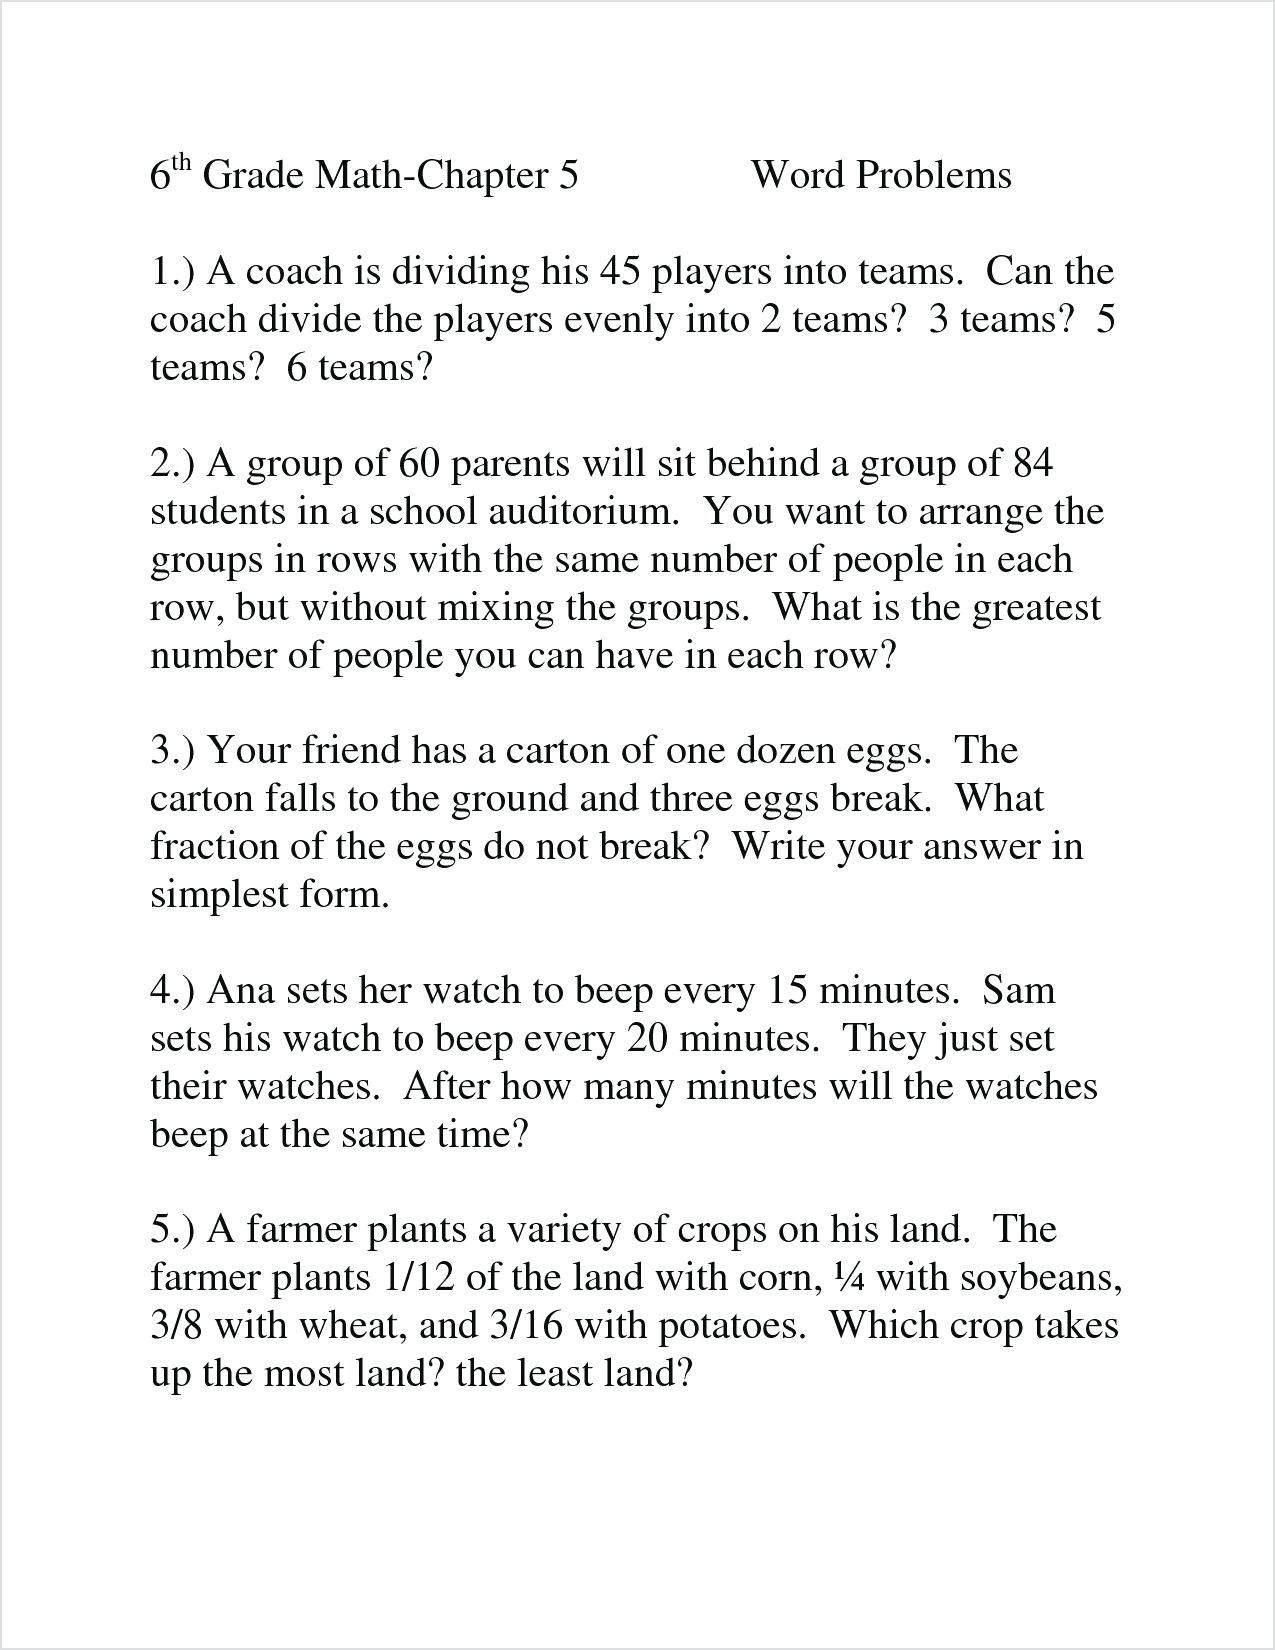 3 Free Math Worksheets Third Grade 3 Division Word Problems learning grade  5 math word proble...   Word problem worksheets [ 1650 x 1275 Pixel ]